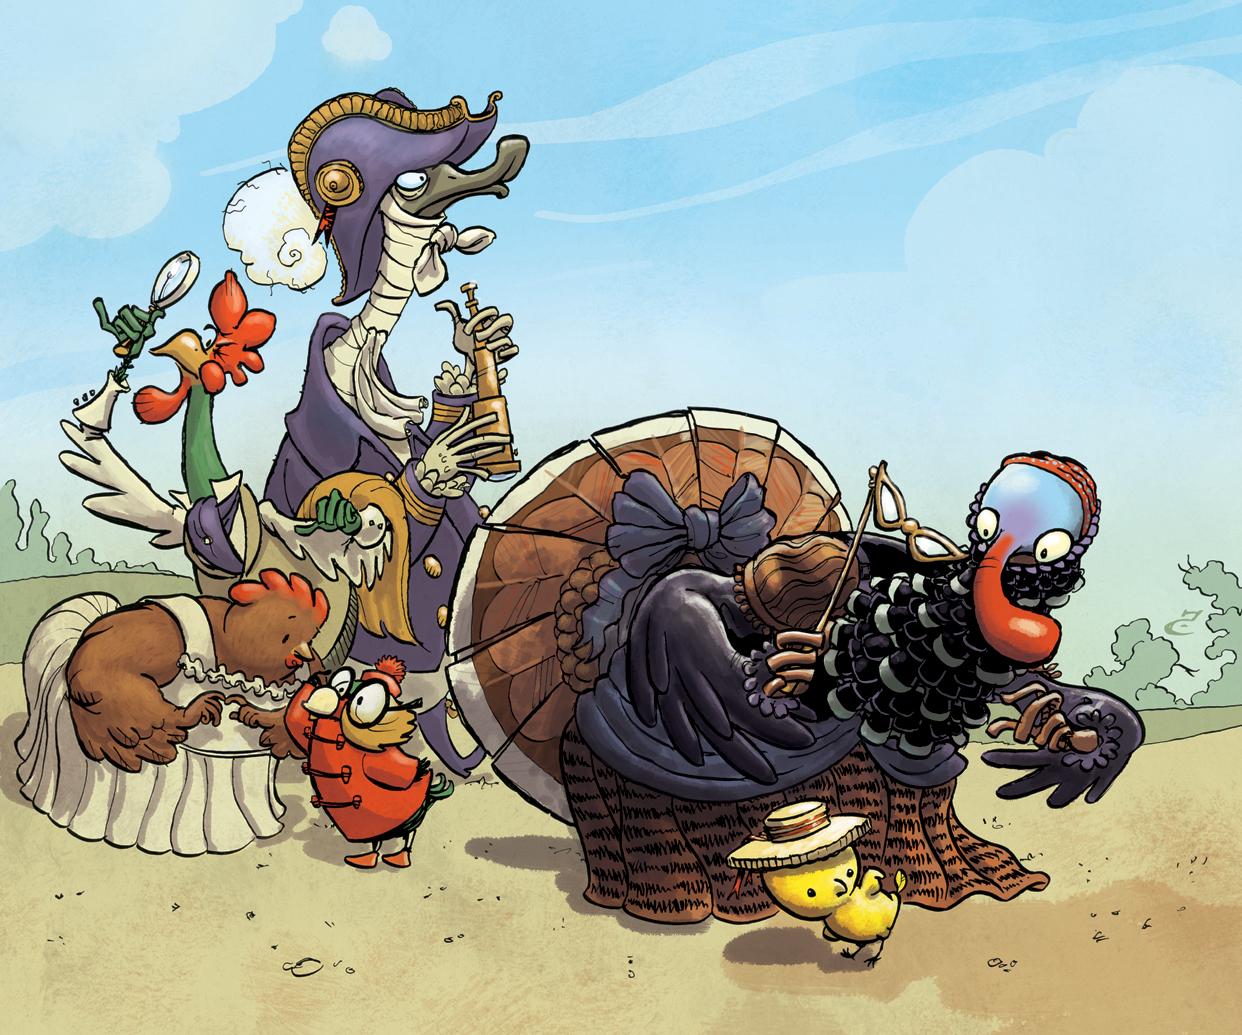 Inkyboy Illustrations By John Aardema At Coroflot